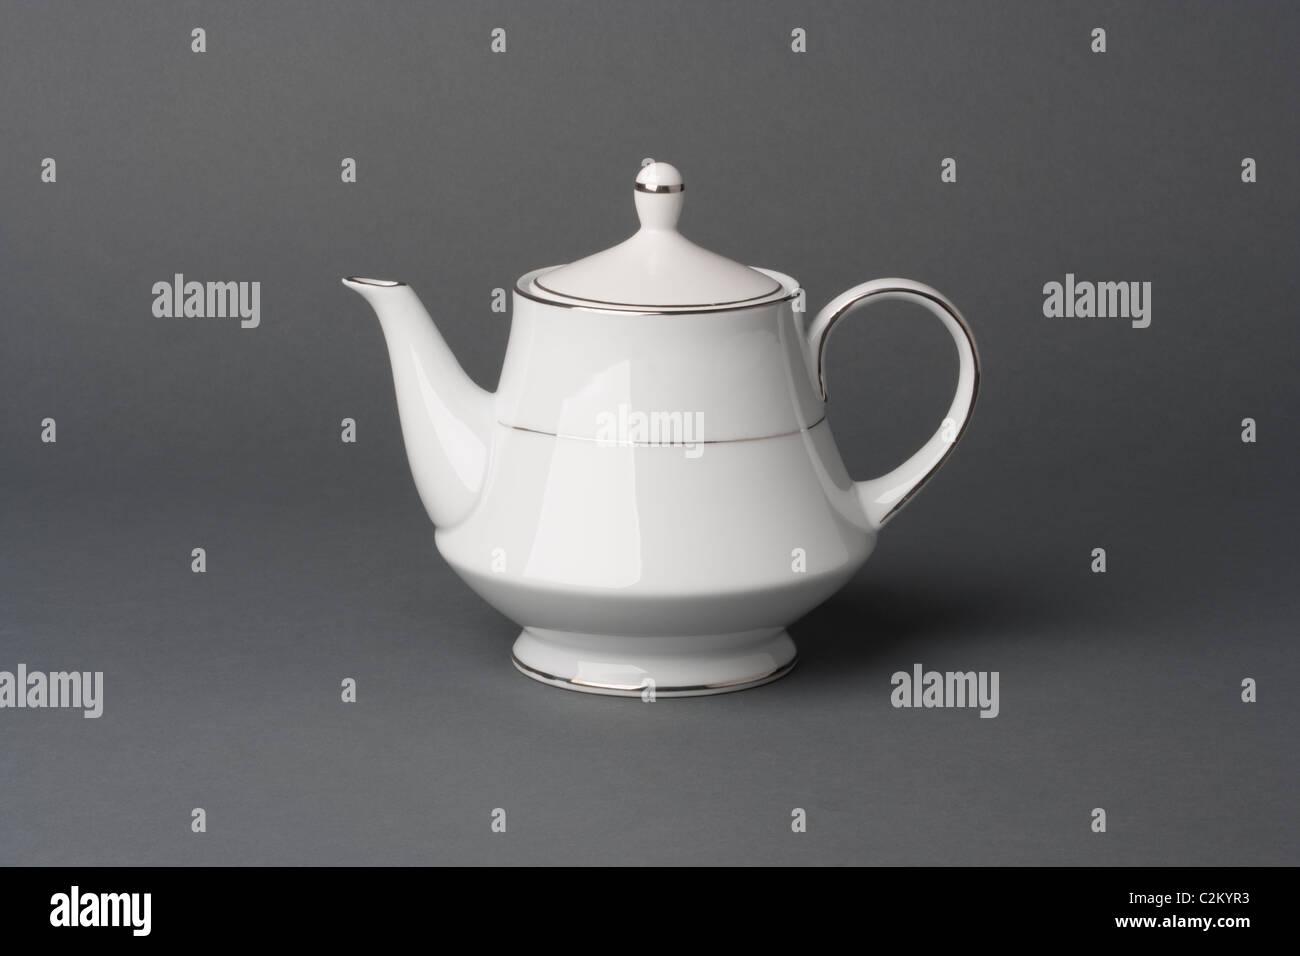 White china tea pot - Stock Image